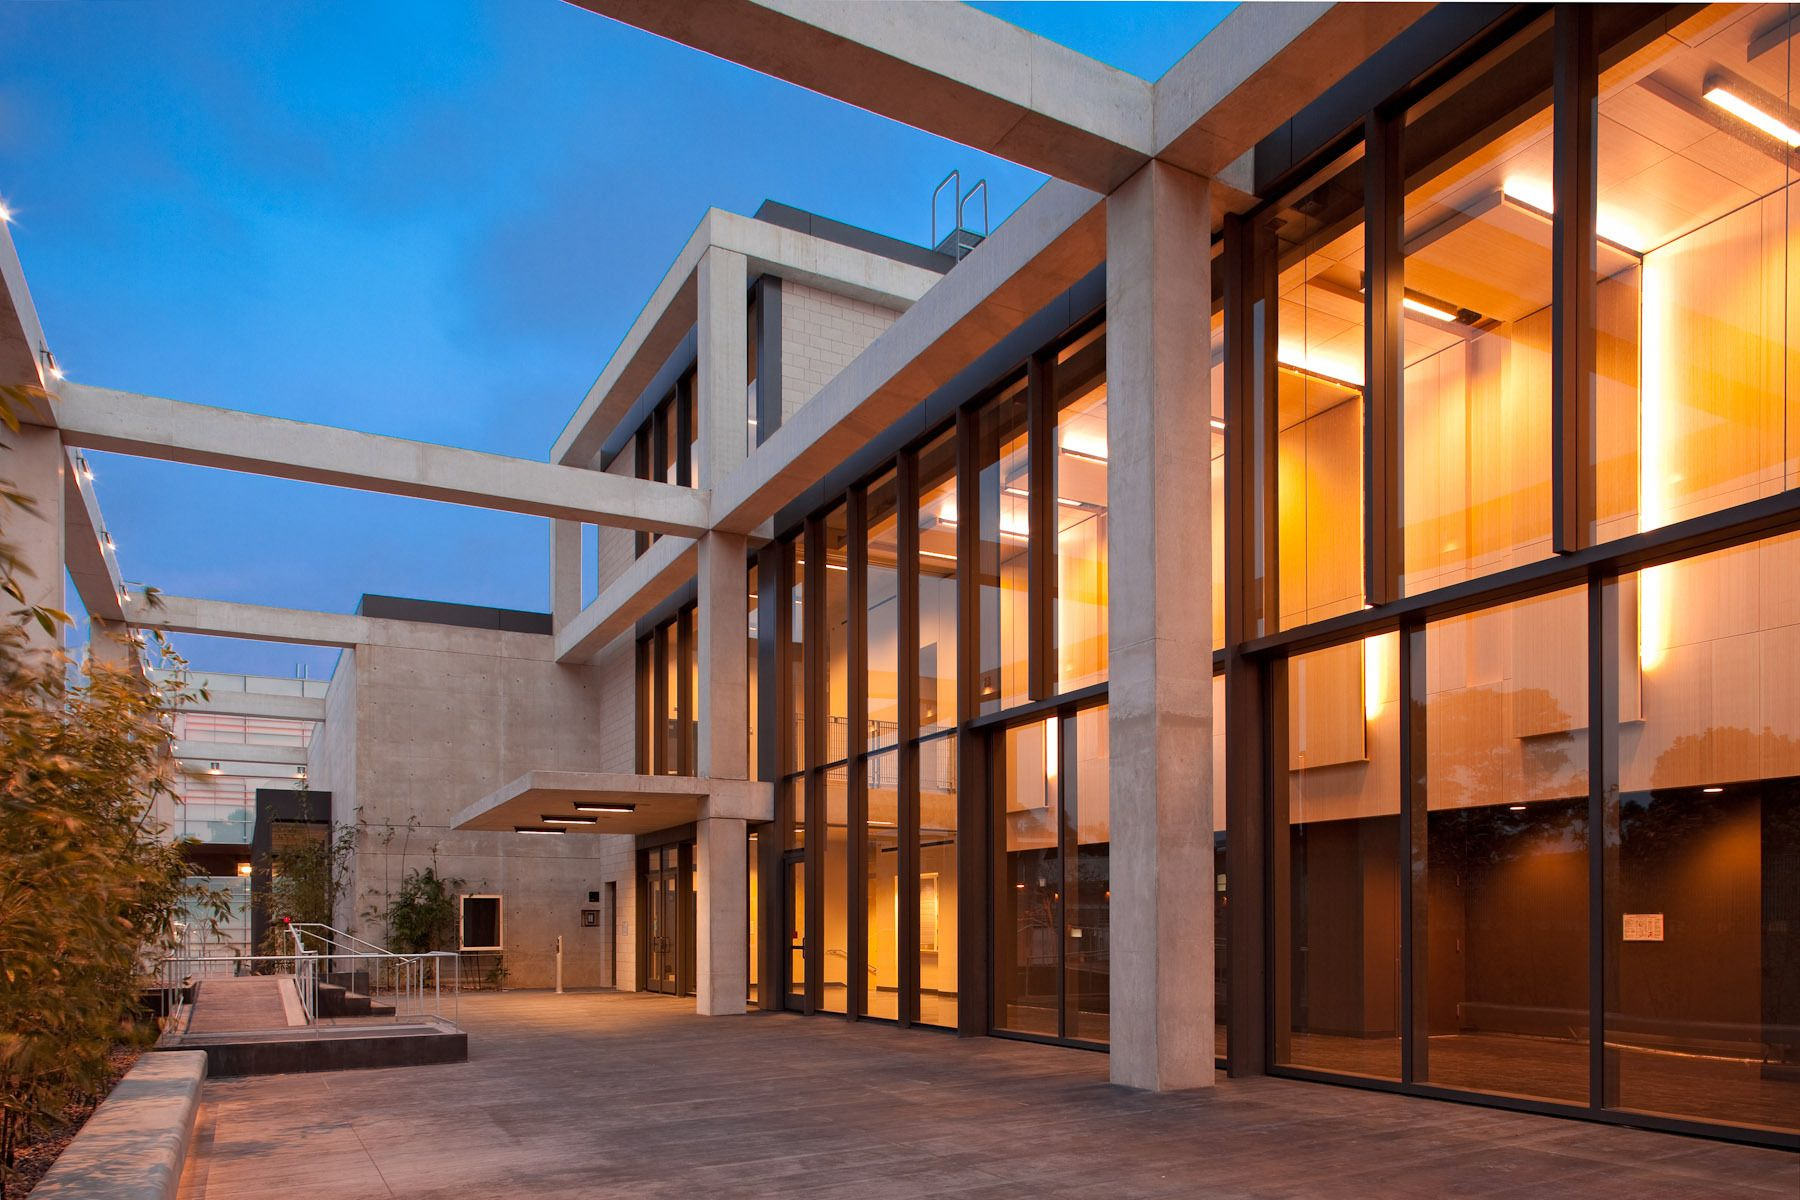 Conrad Prebys Music Hall at UC San Diego